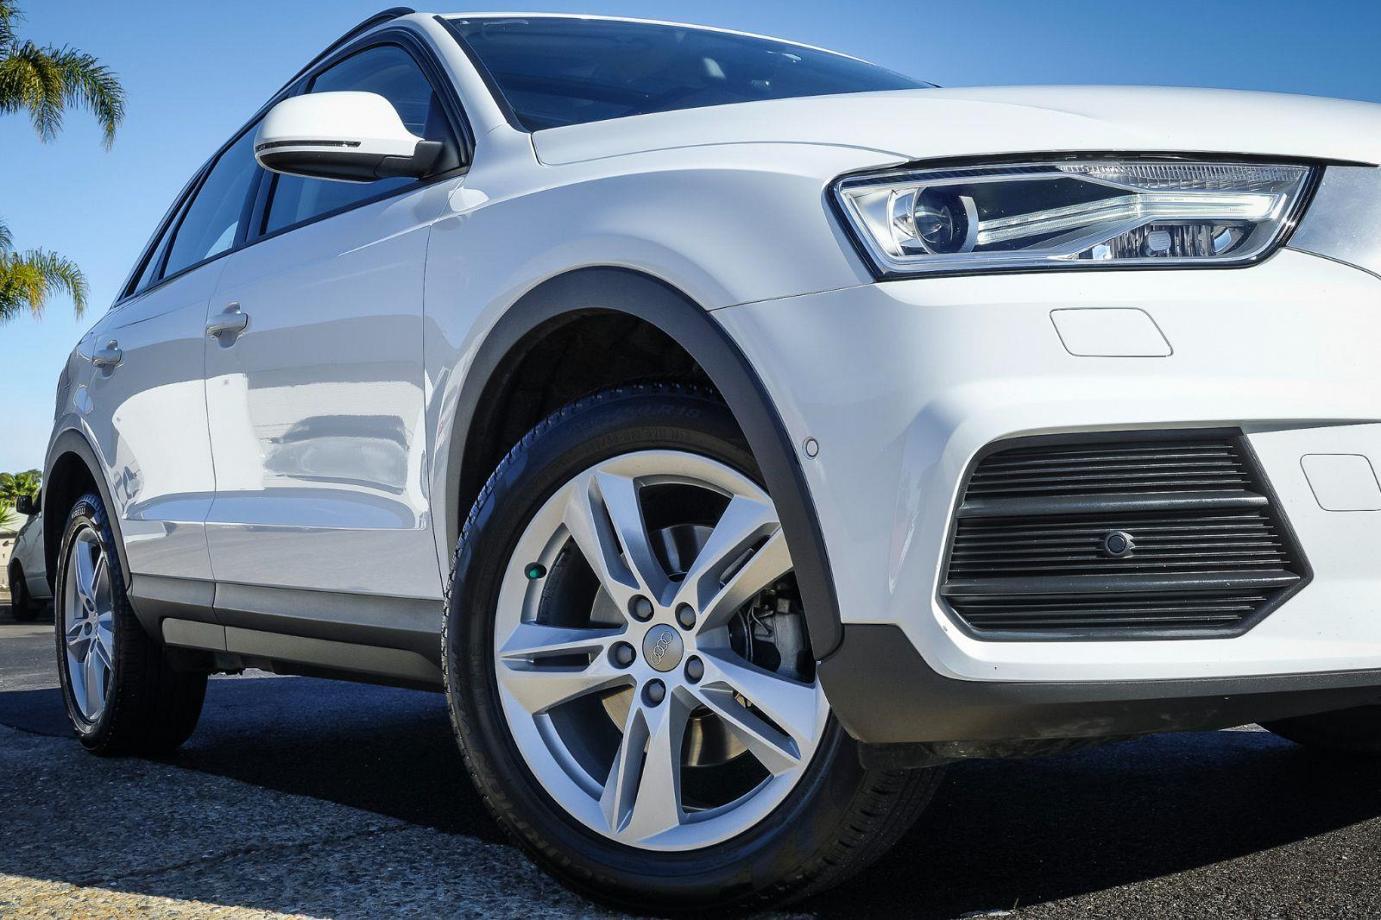 2016 Audi Q3 8U MY17 TFSI. Wagon 5dr S tronic 6sp 1.4T 110kW